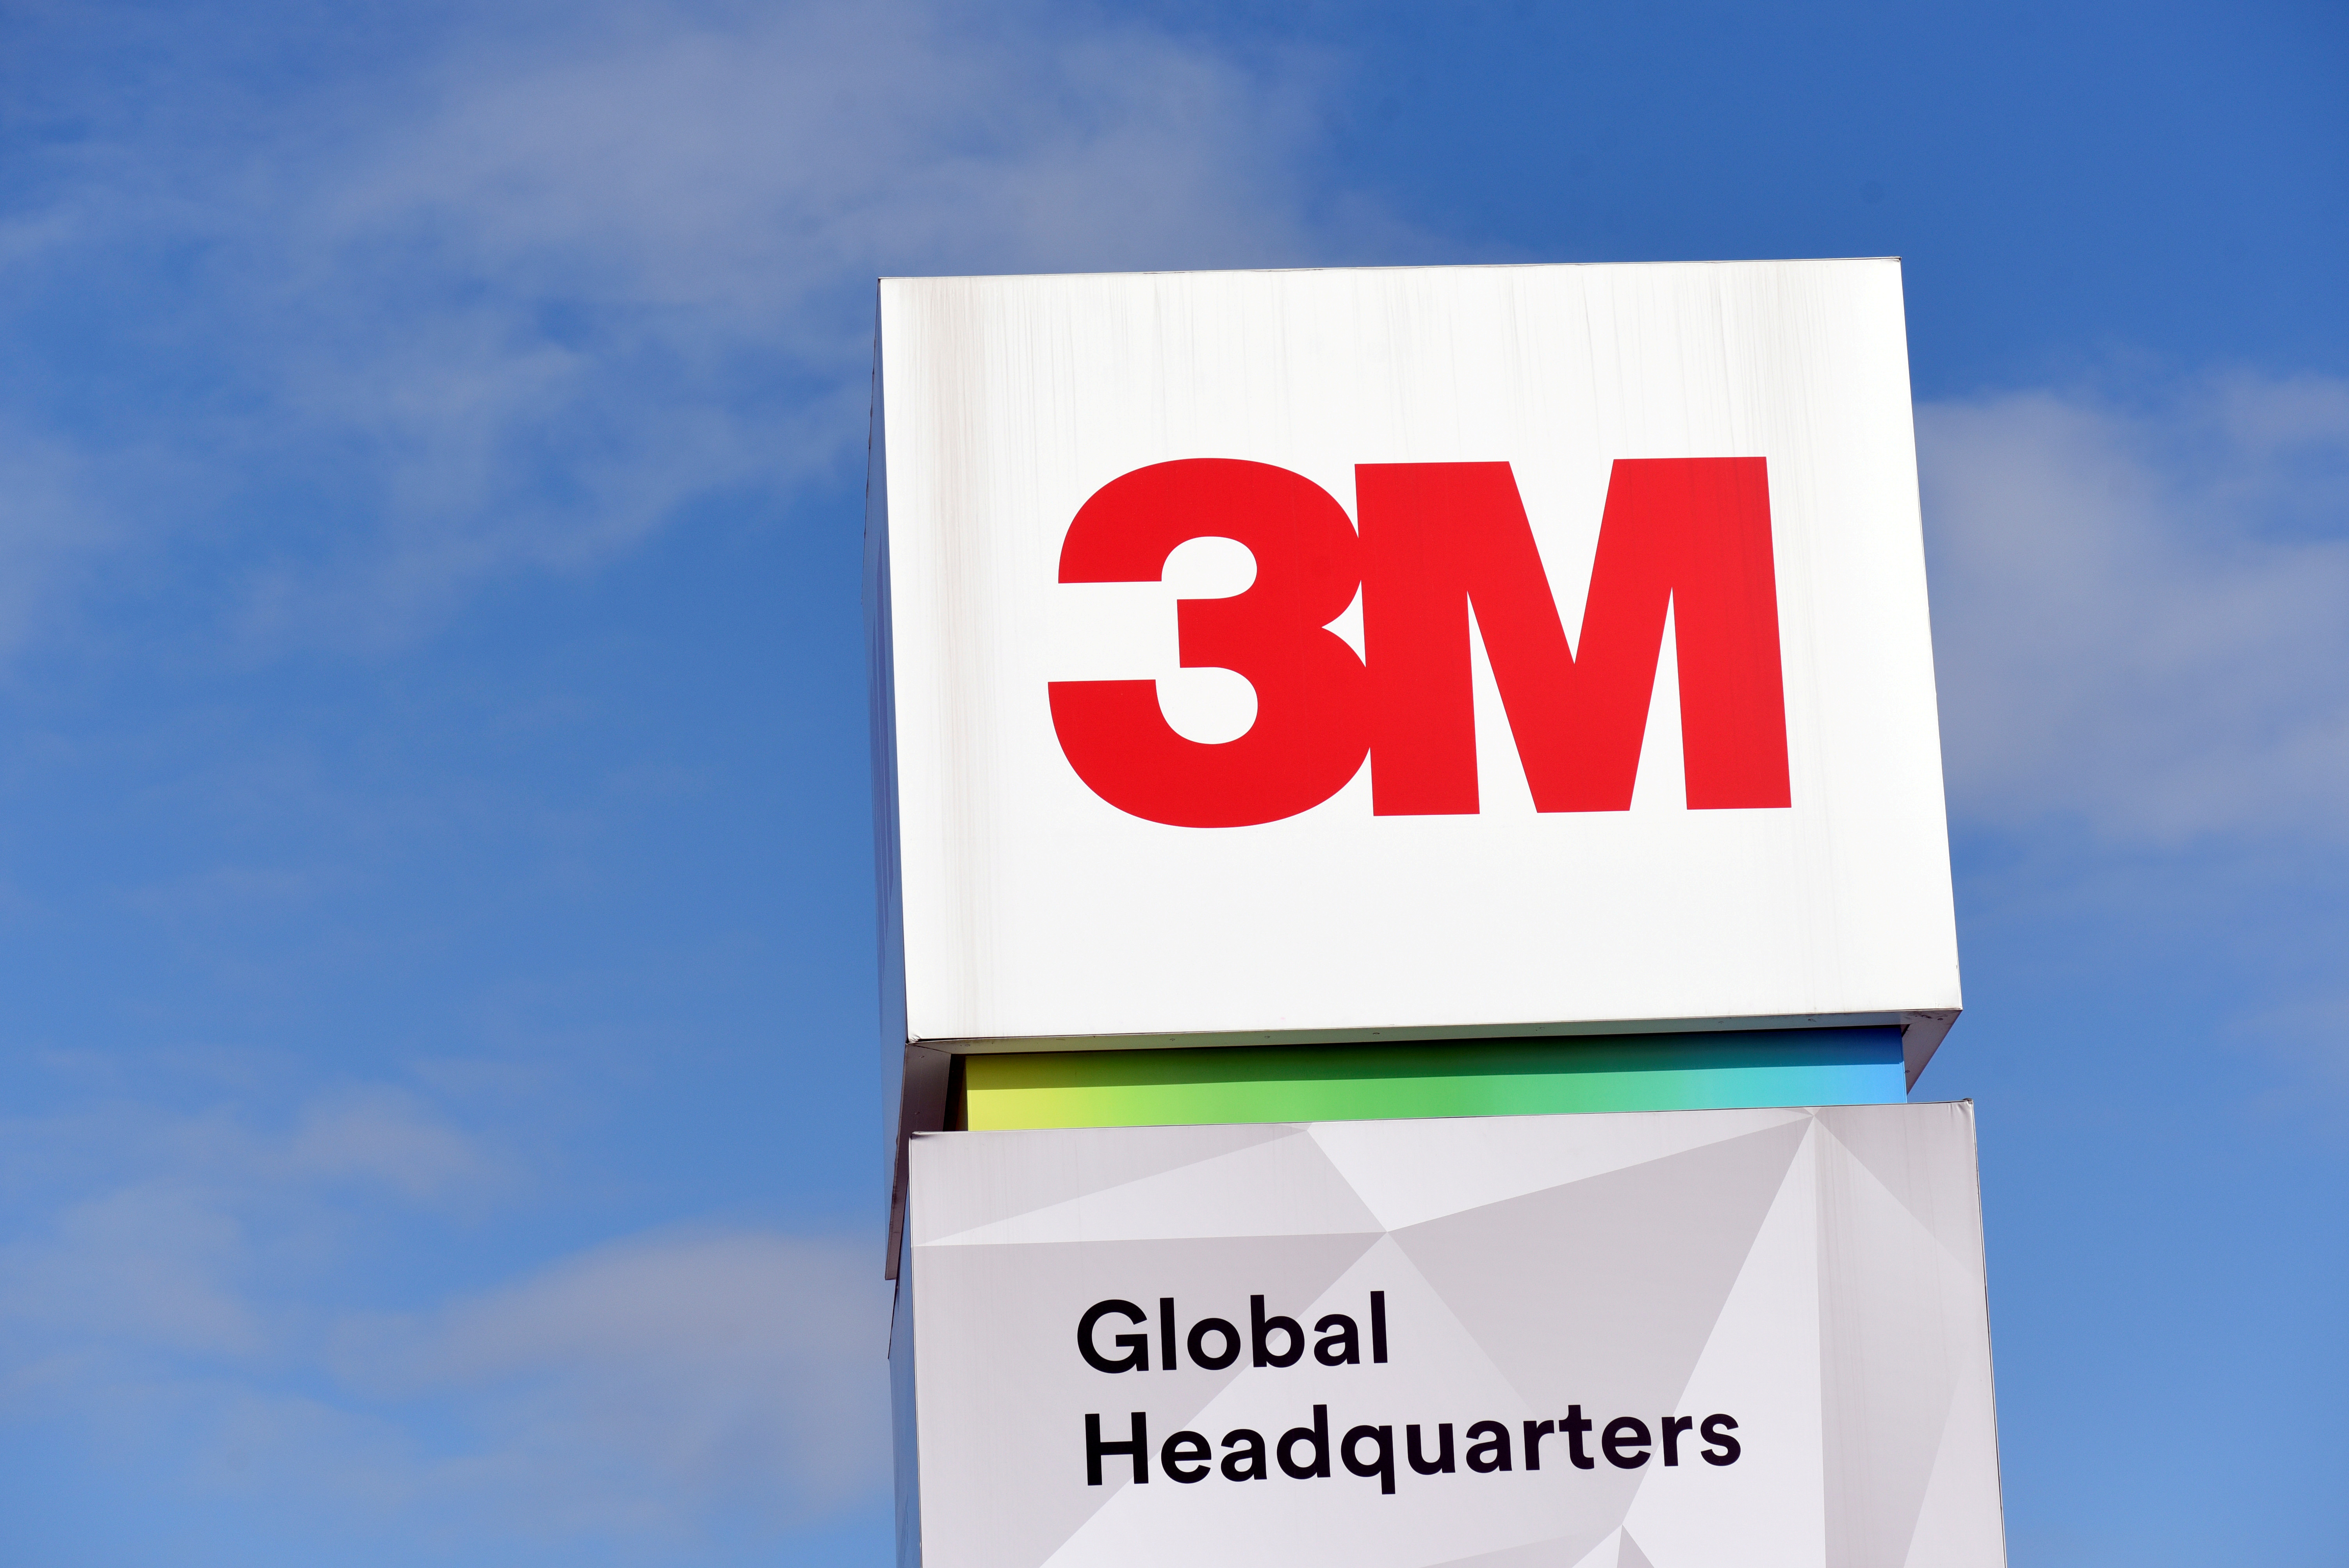 The 3M logo is seen at its global headquarters in Maplewood, Minnesota, U.S. on March 4, 2020.  REUTERS/Nicholas Pfosi